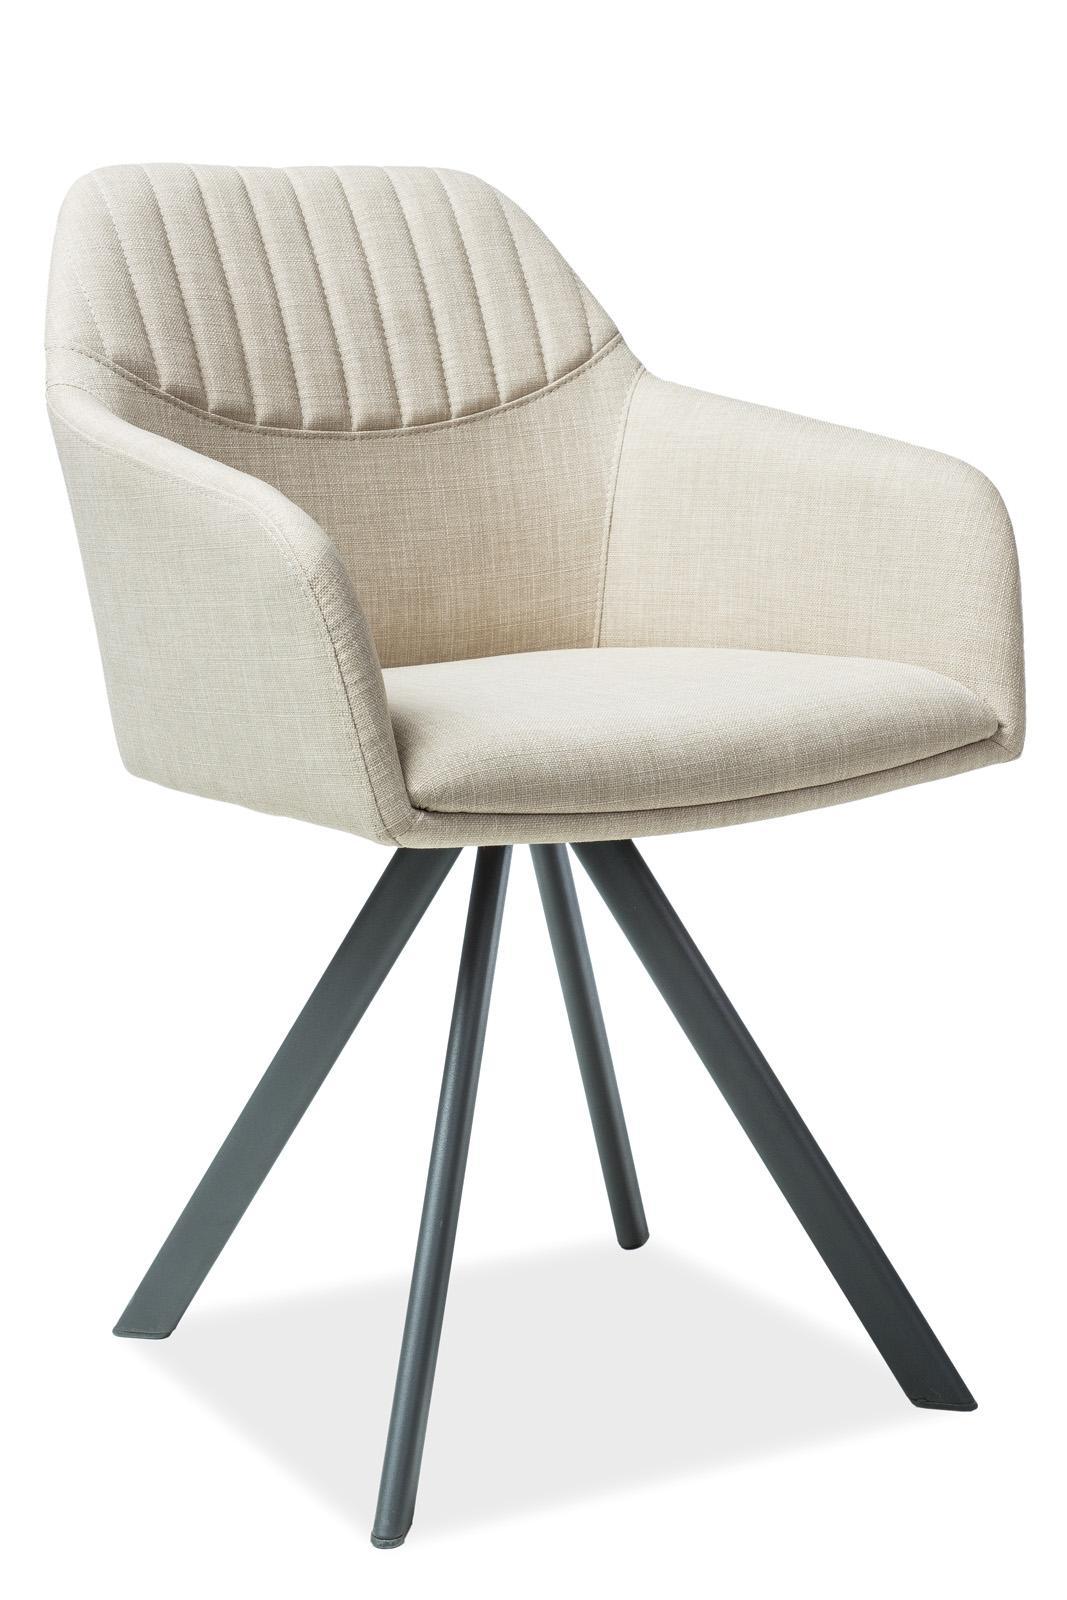 Signal Jedálenská stolička MILTON II Farba: Sivá